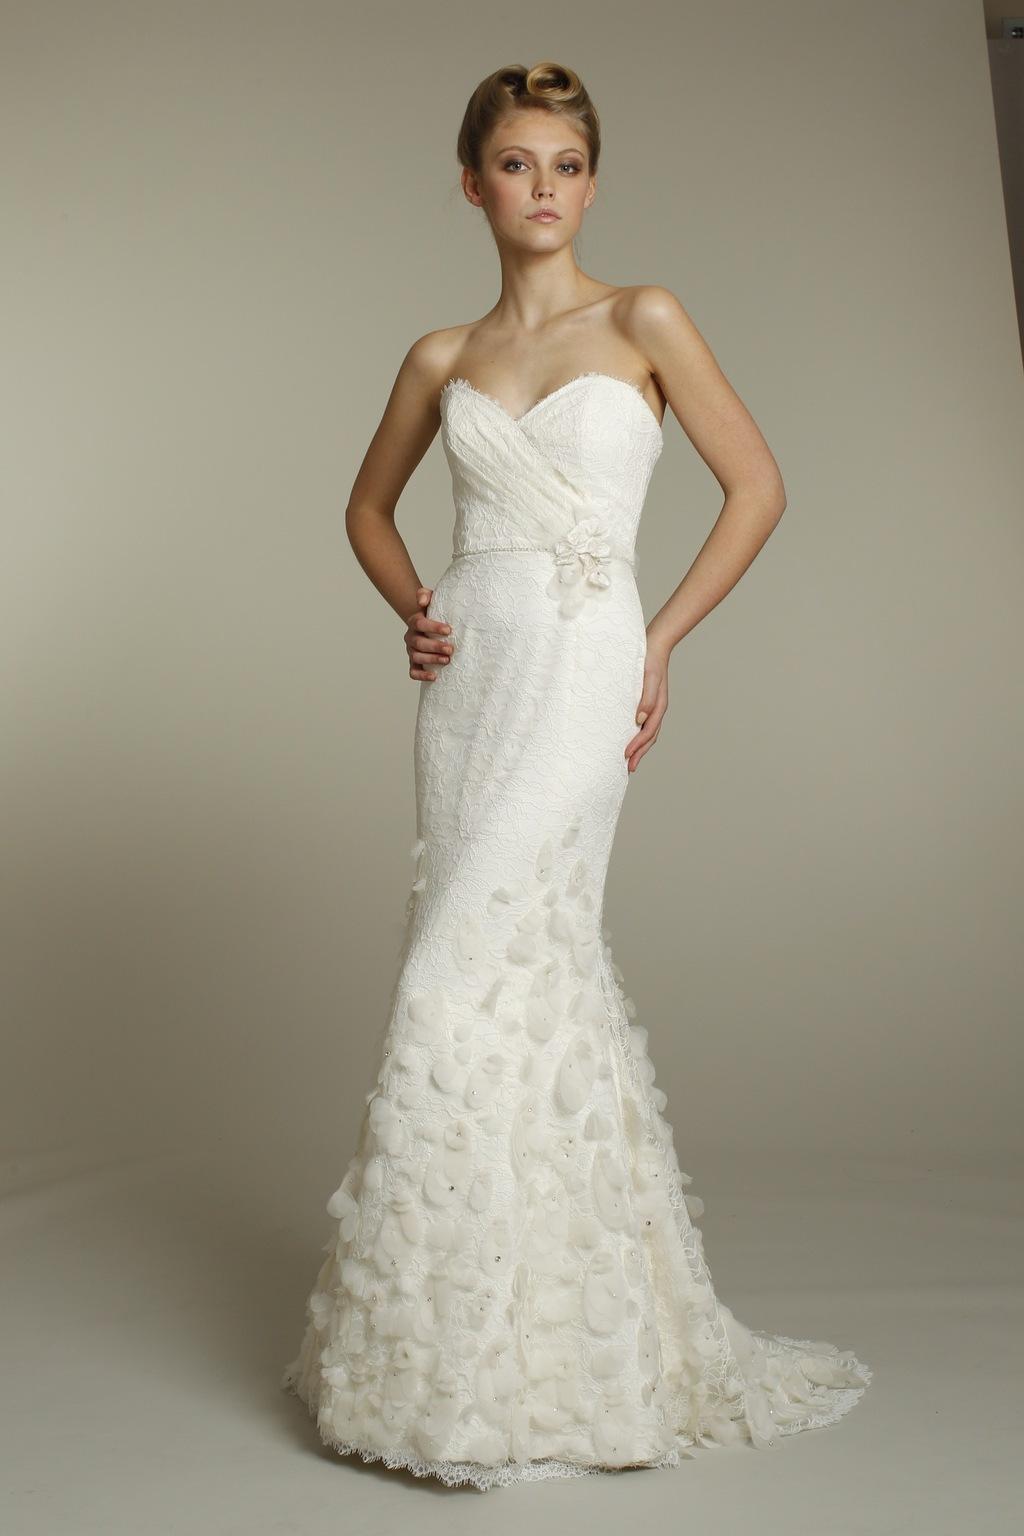 9163-alvina-valenta-wedding-dress-2011-bridal-gowns-ivory-mermaid-ivory-front.full